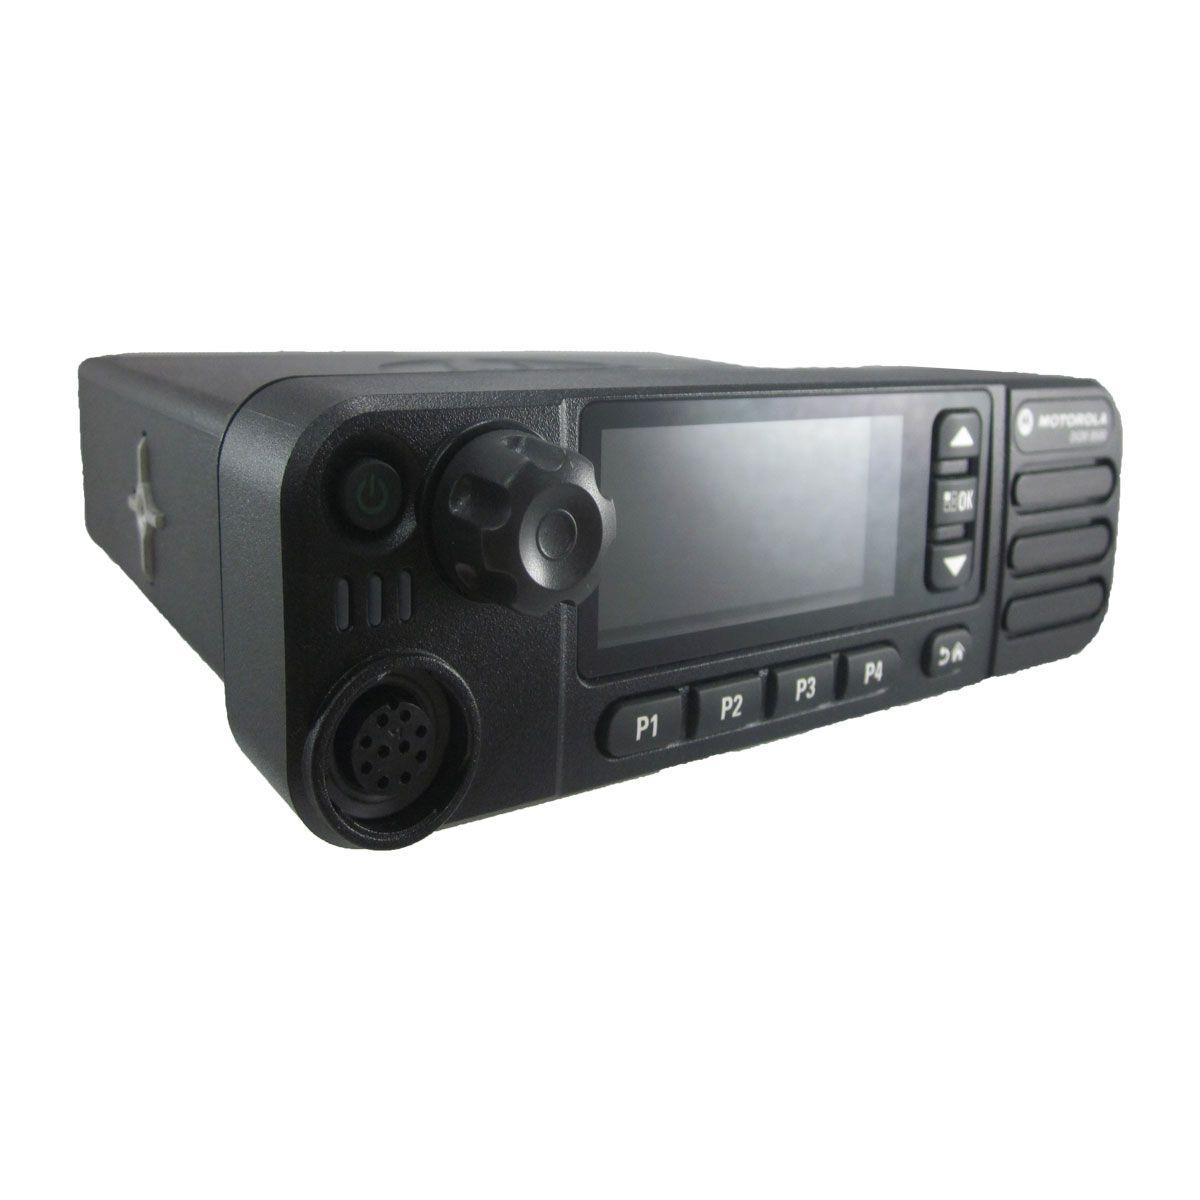 Radio Móvil Motorola DGM 8500  Digital